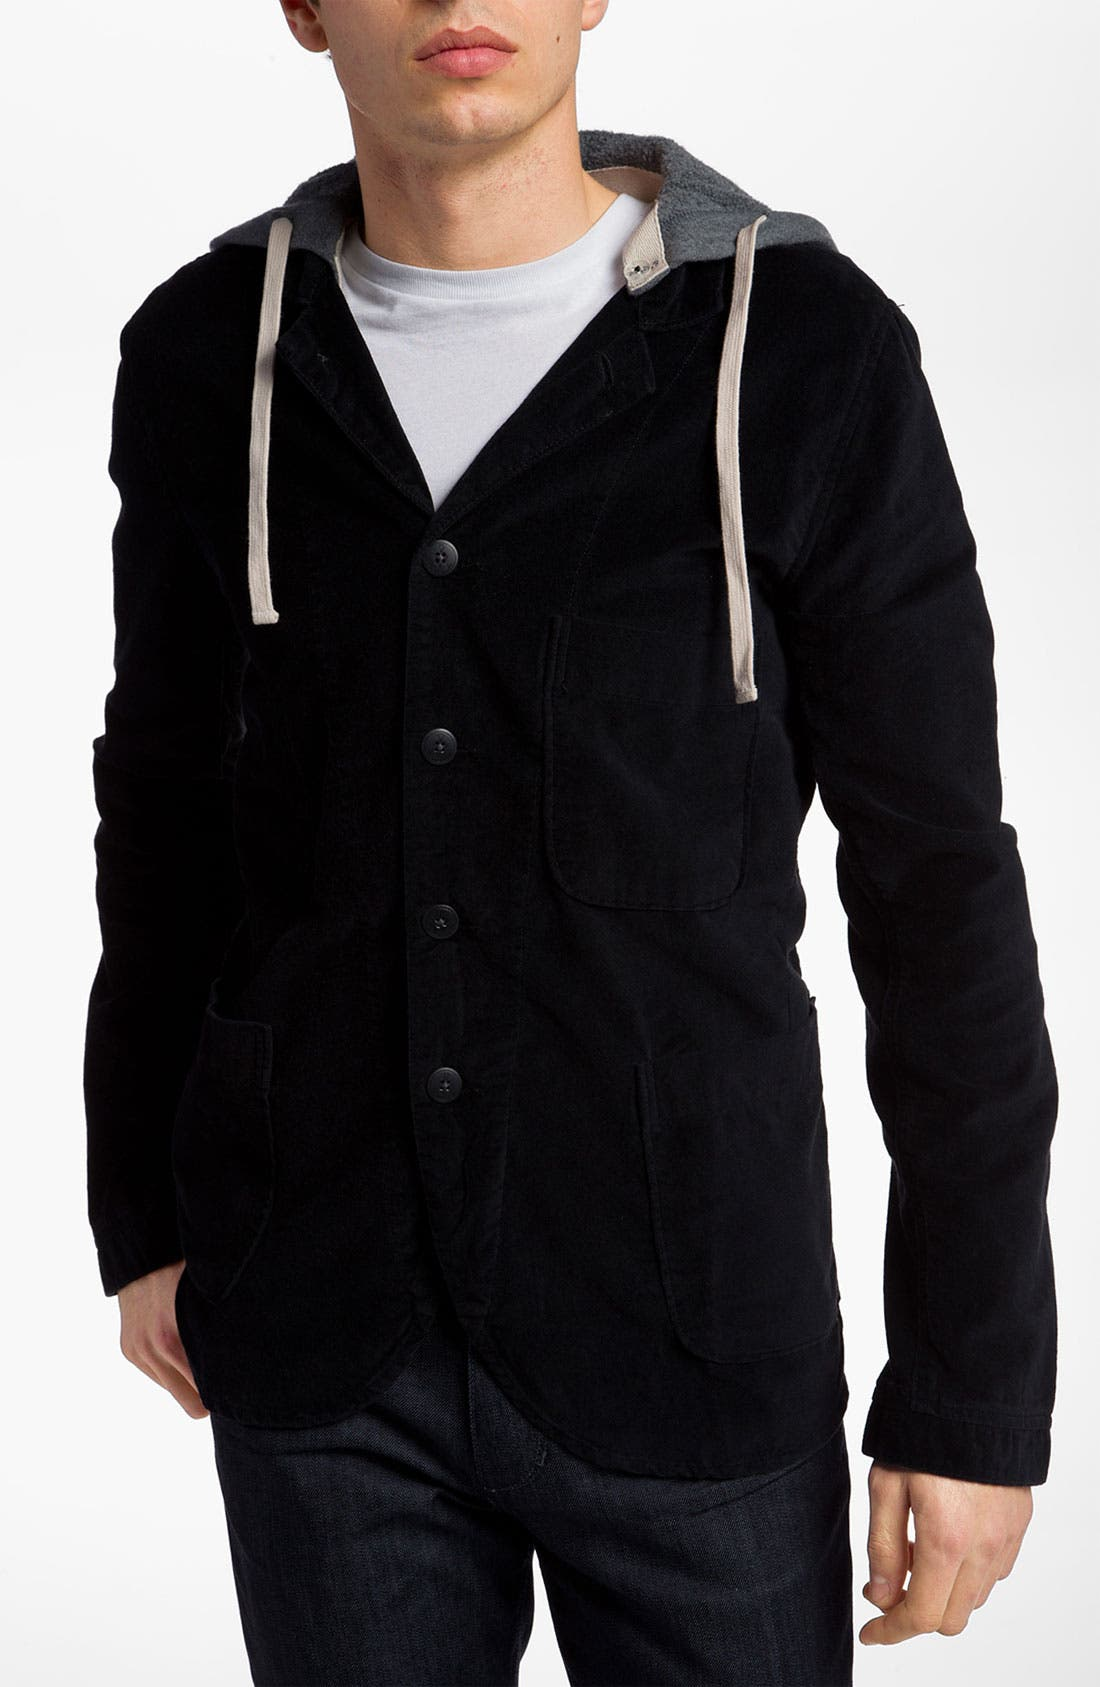 Alternate Image 1 Selected - Alternative 'Bridgeport' Hooded Blazer Style Jacket